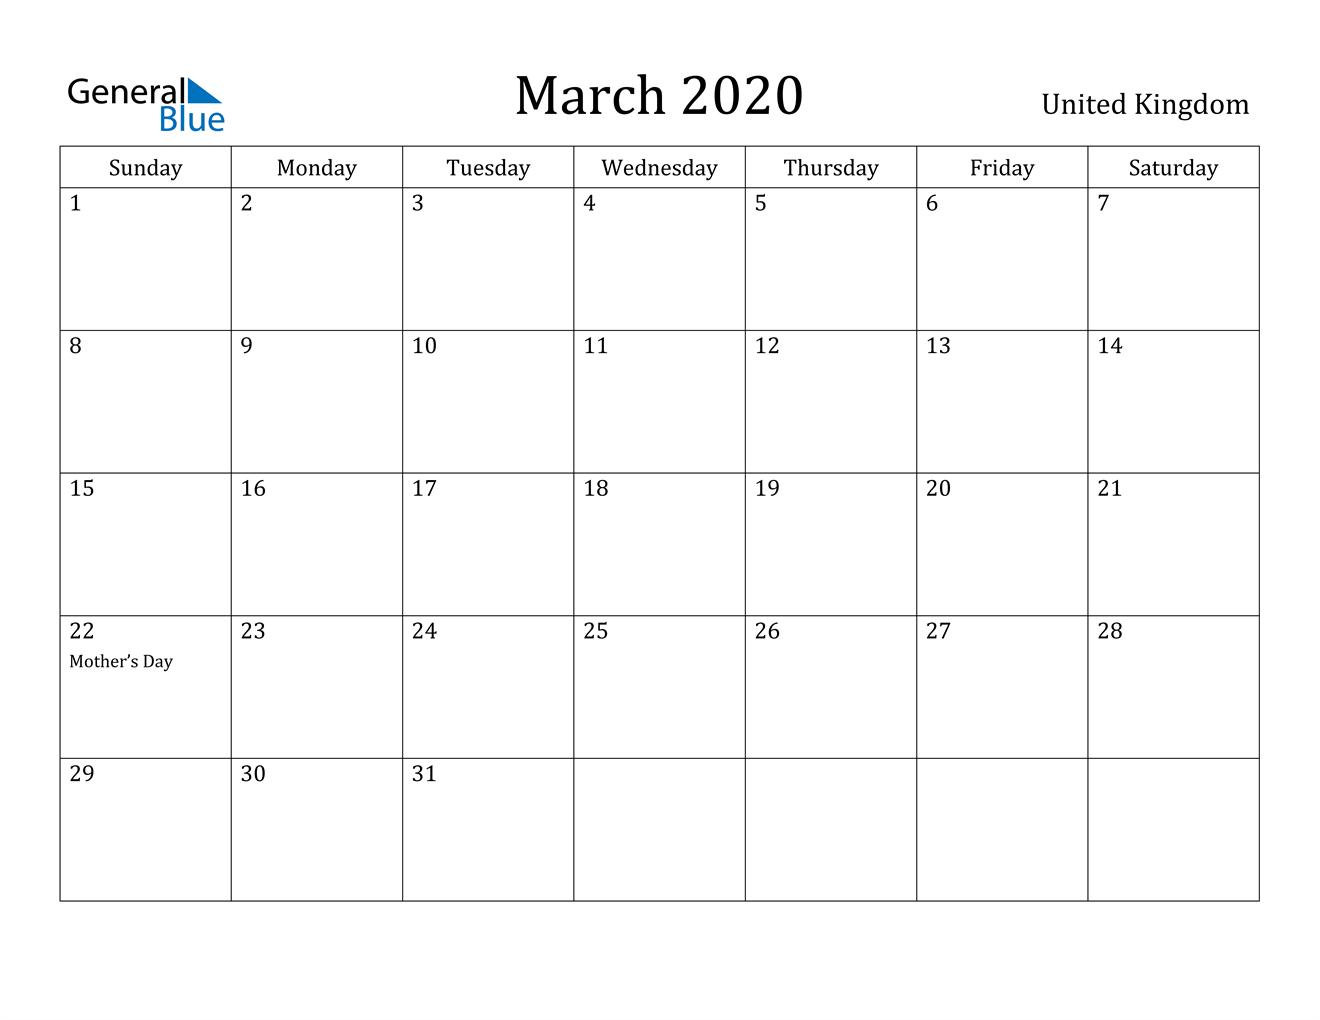 Image of March 2020 United Kingdom Calendar with Holidays Calendar